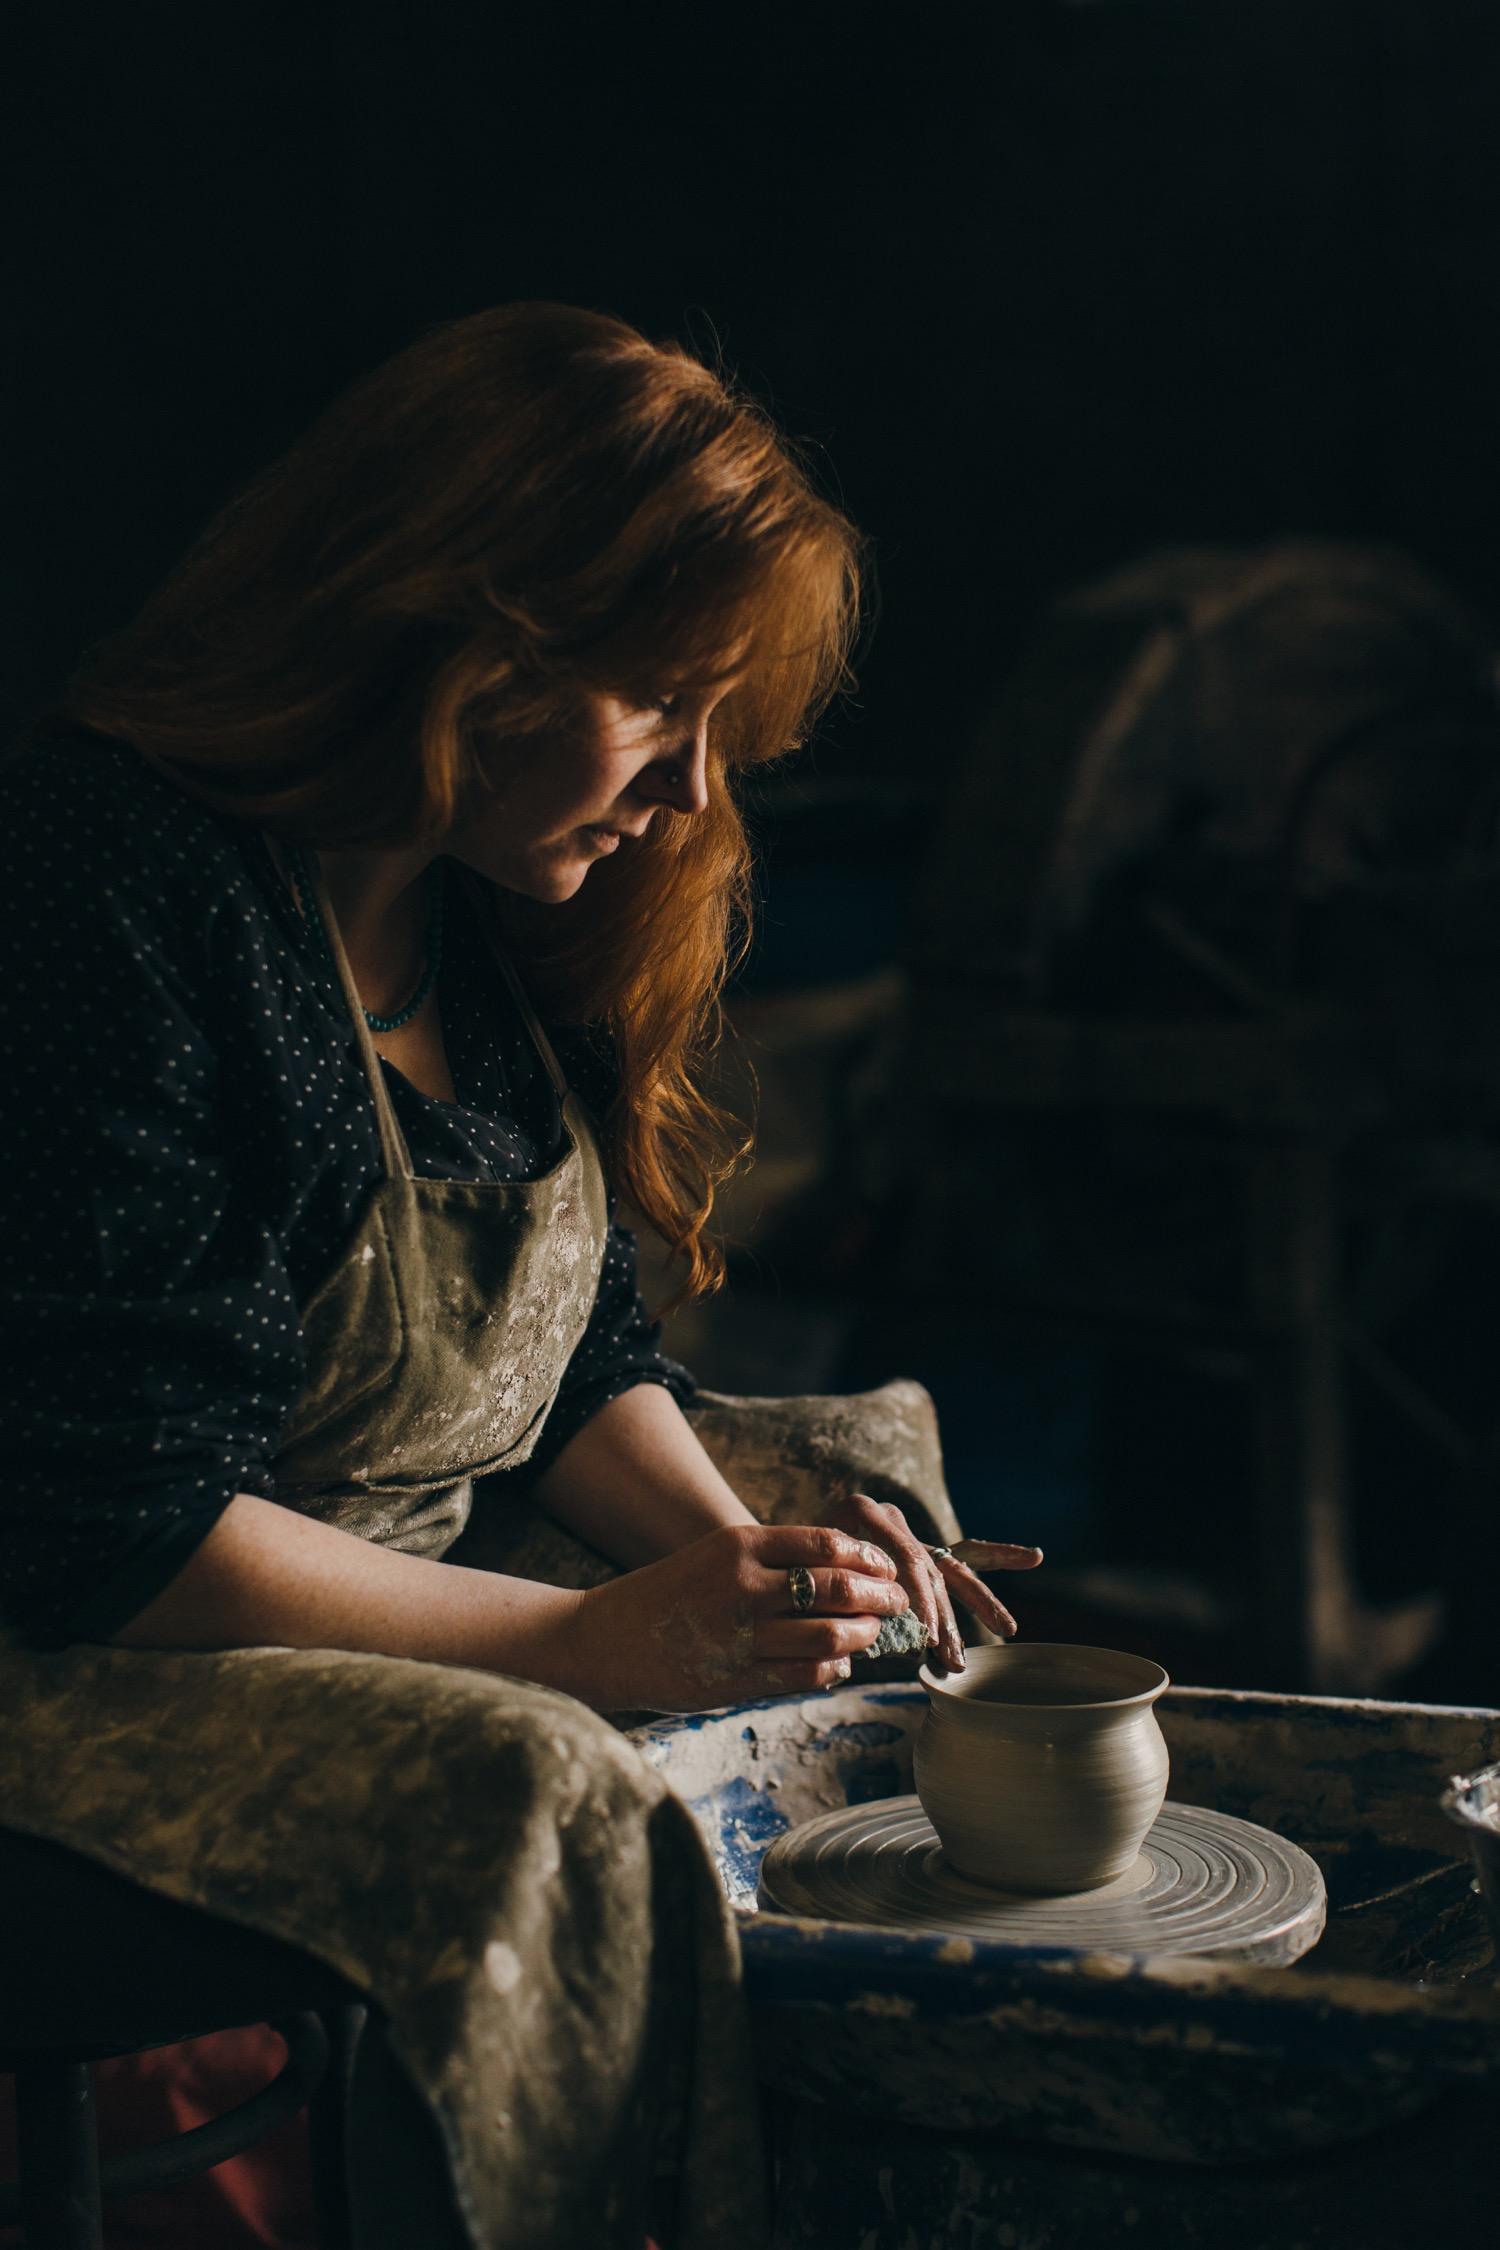 Ciara Campbell Ceramics - The potter at work